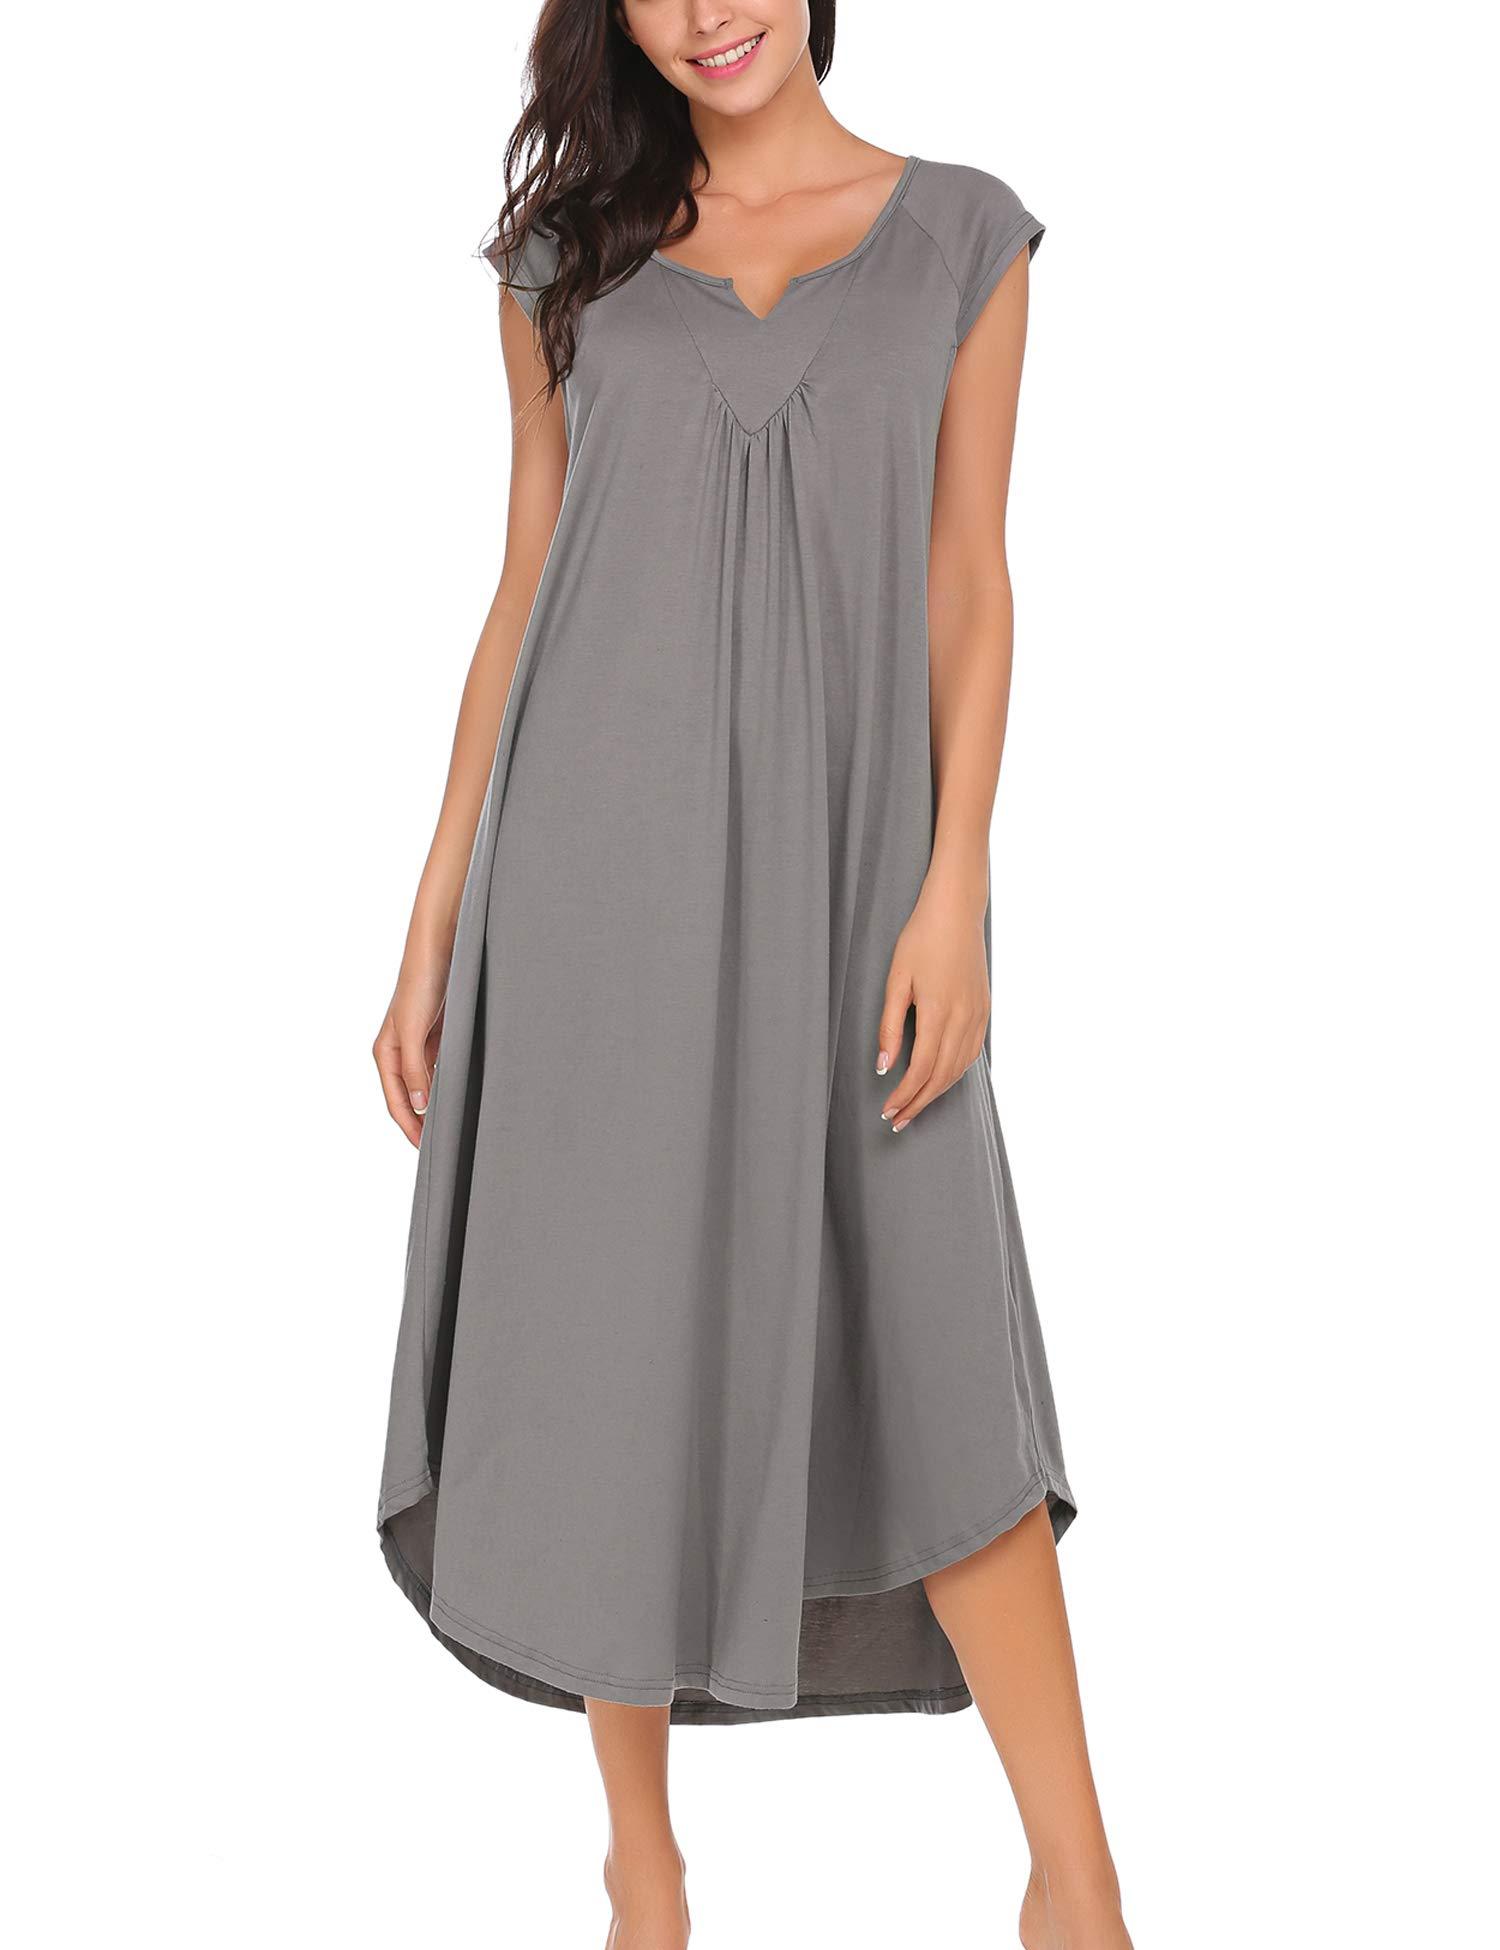 Ekouaer Women's Lingerie V Neck Nightwear Sexy Cotton Sleepwear Babydoll Pajamas Sleep dress, Grey, X-Large